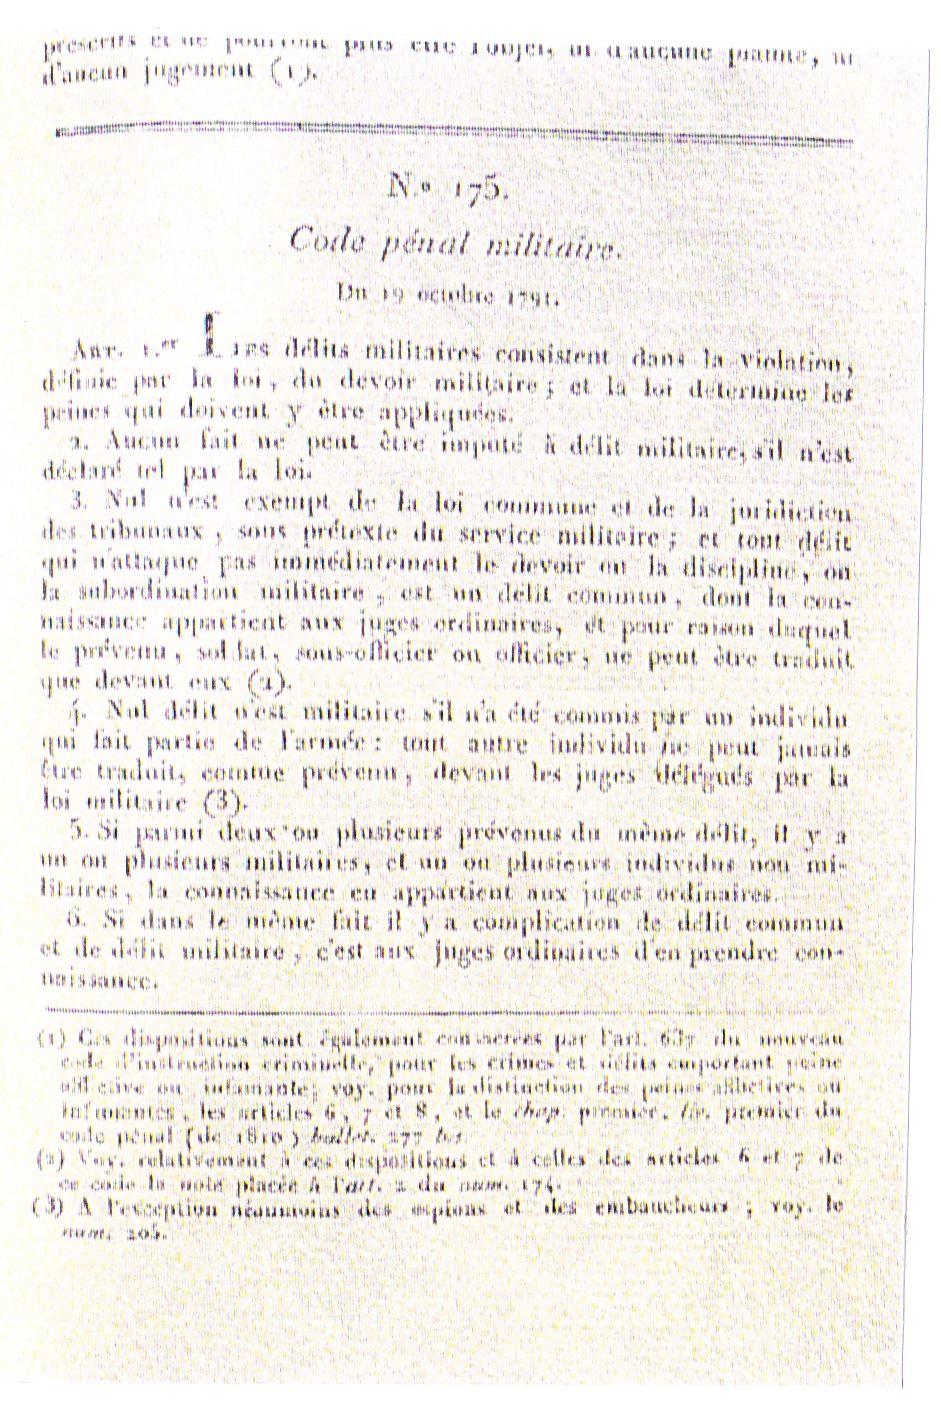 SH page 12 code penal